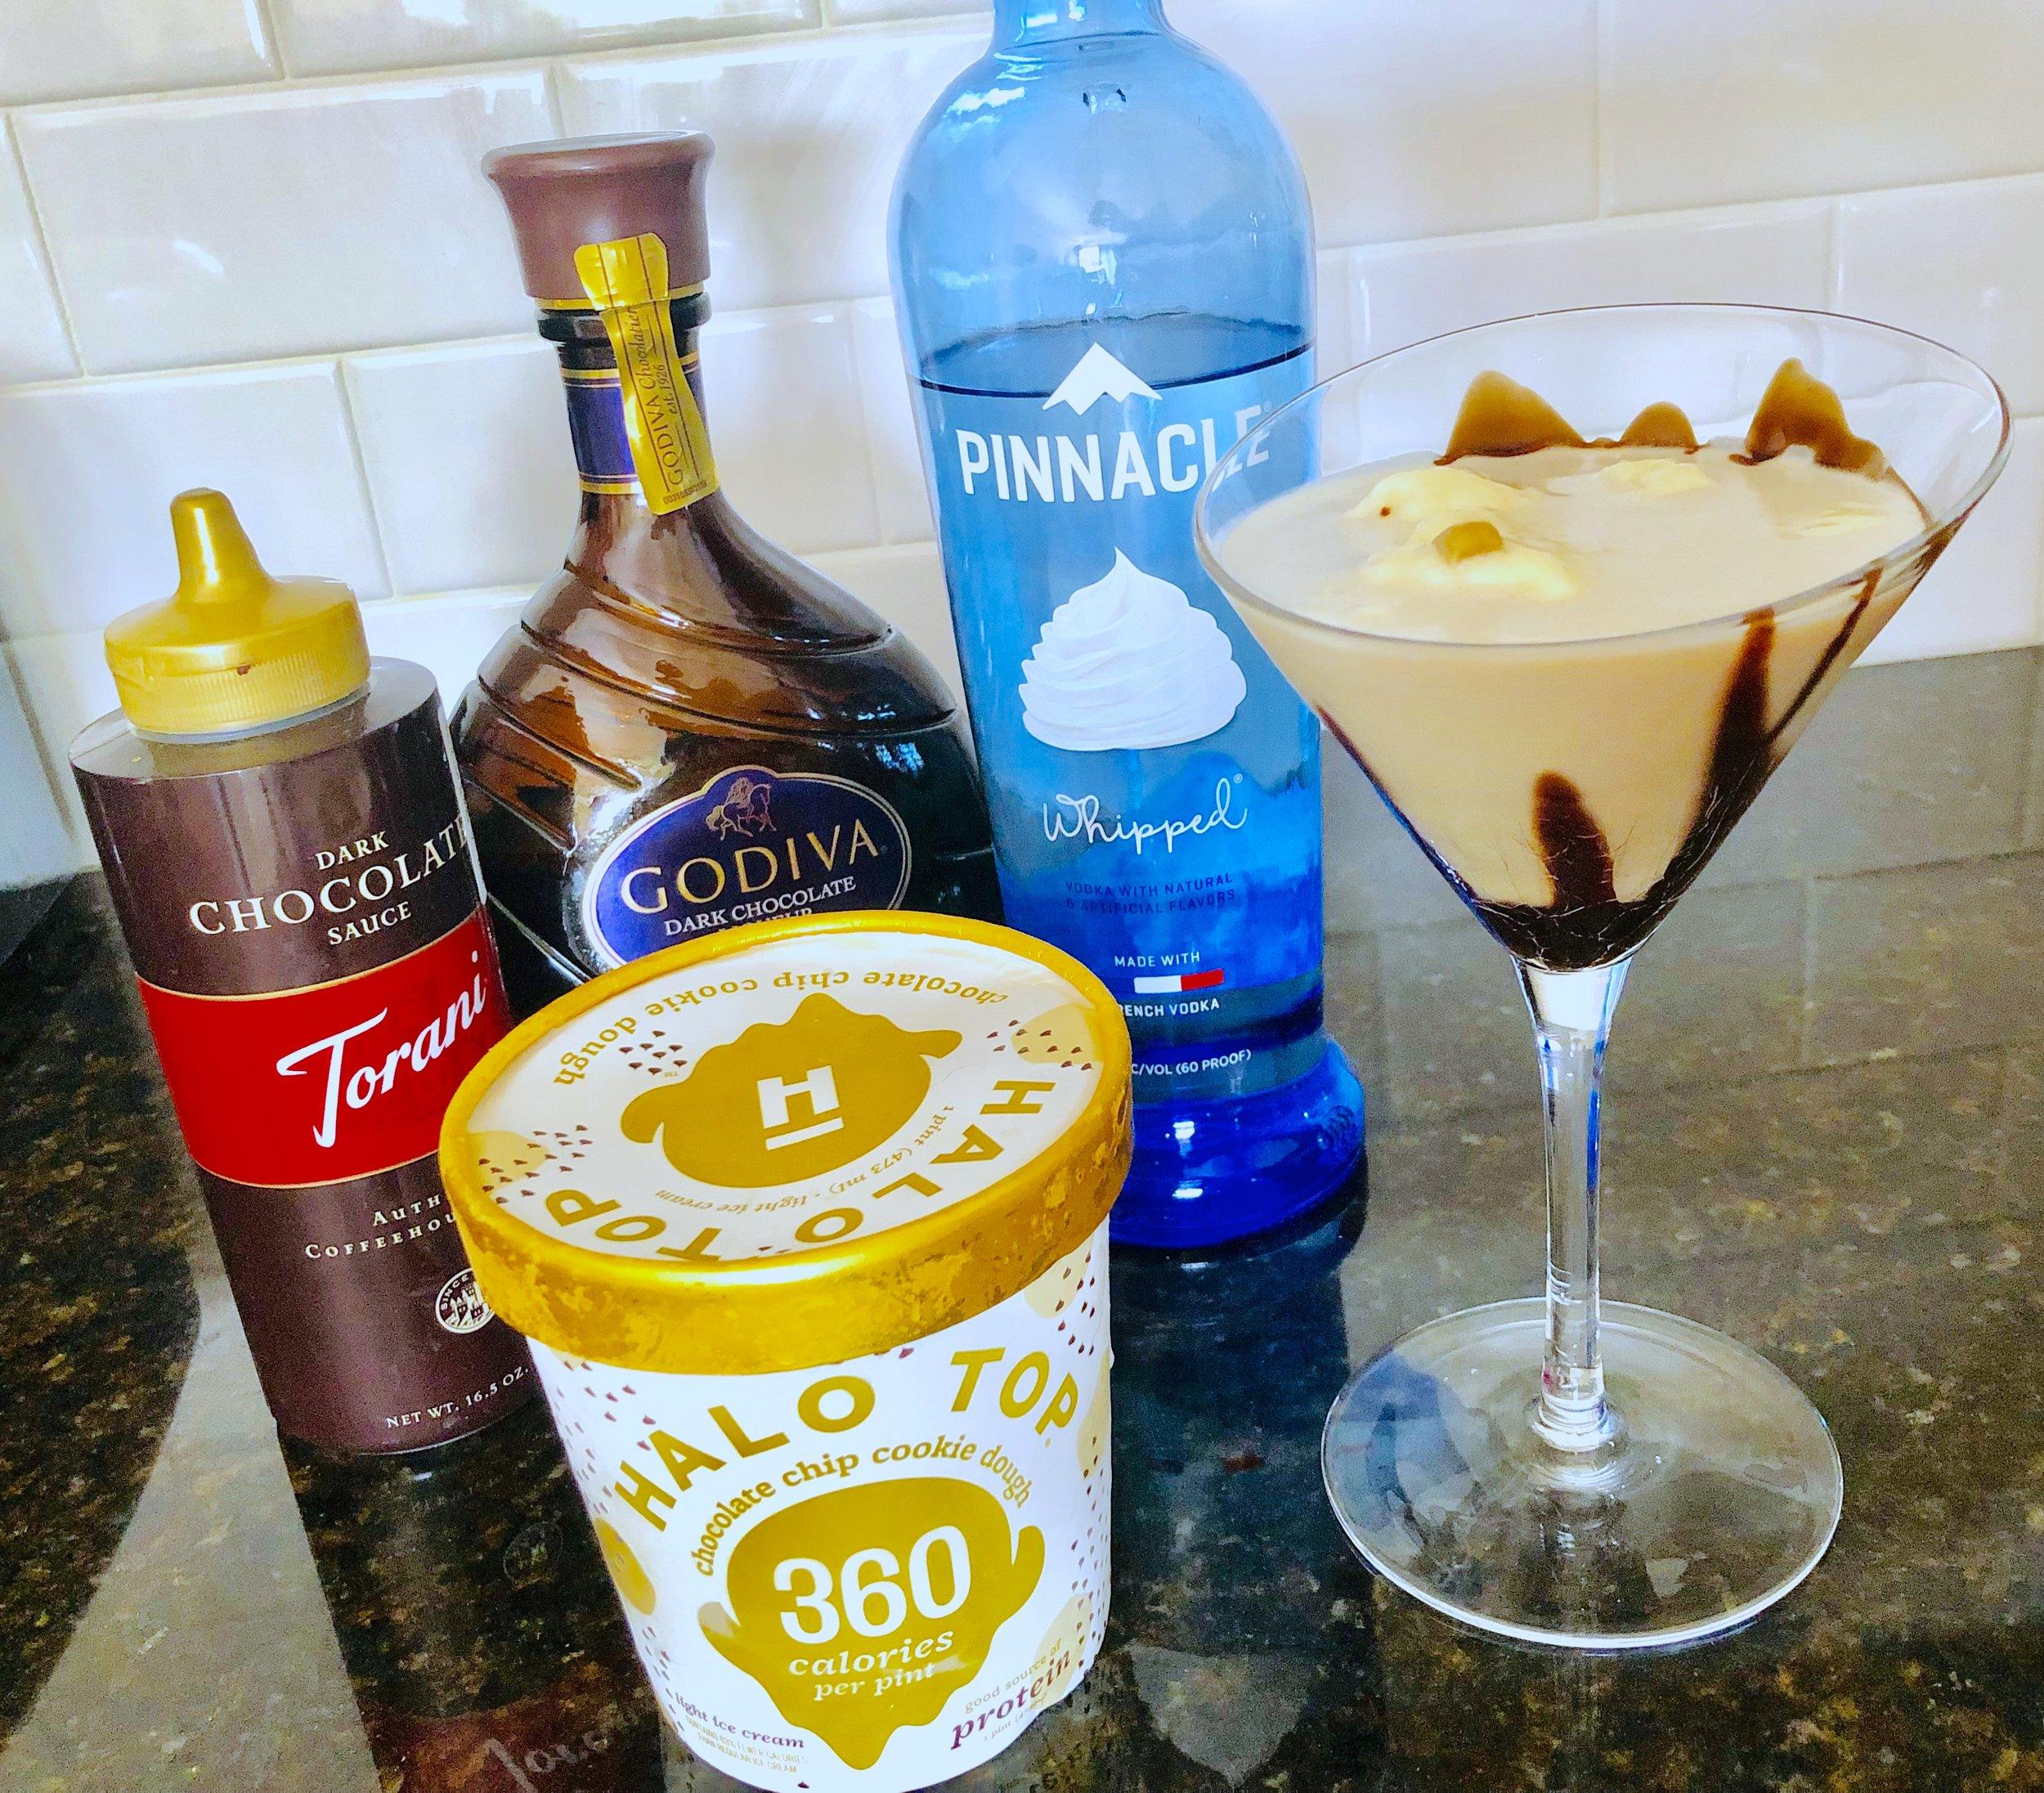 Heather's Flingin' Flangin' Milkshake Martini / Handbag Marinara / @handbagmarinara